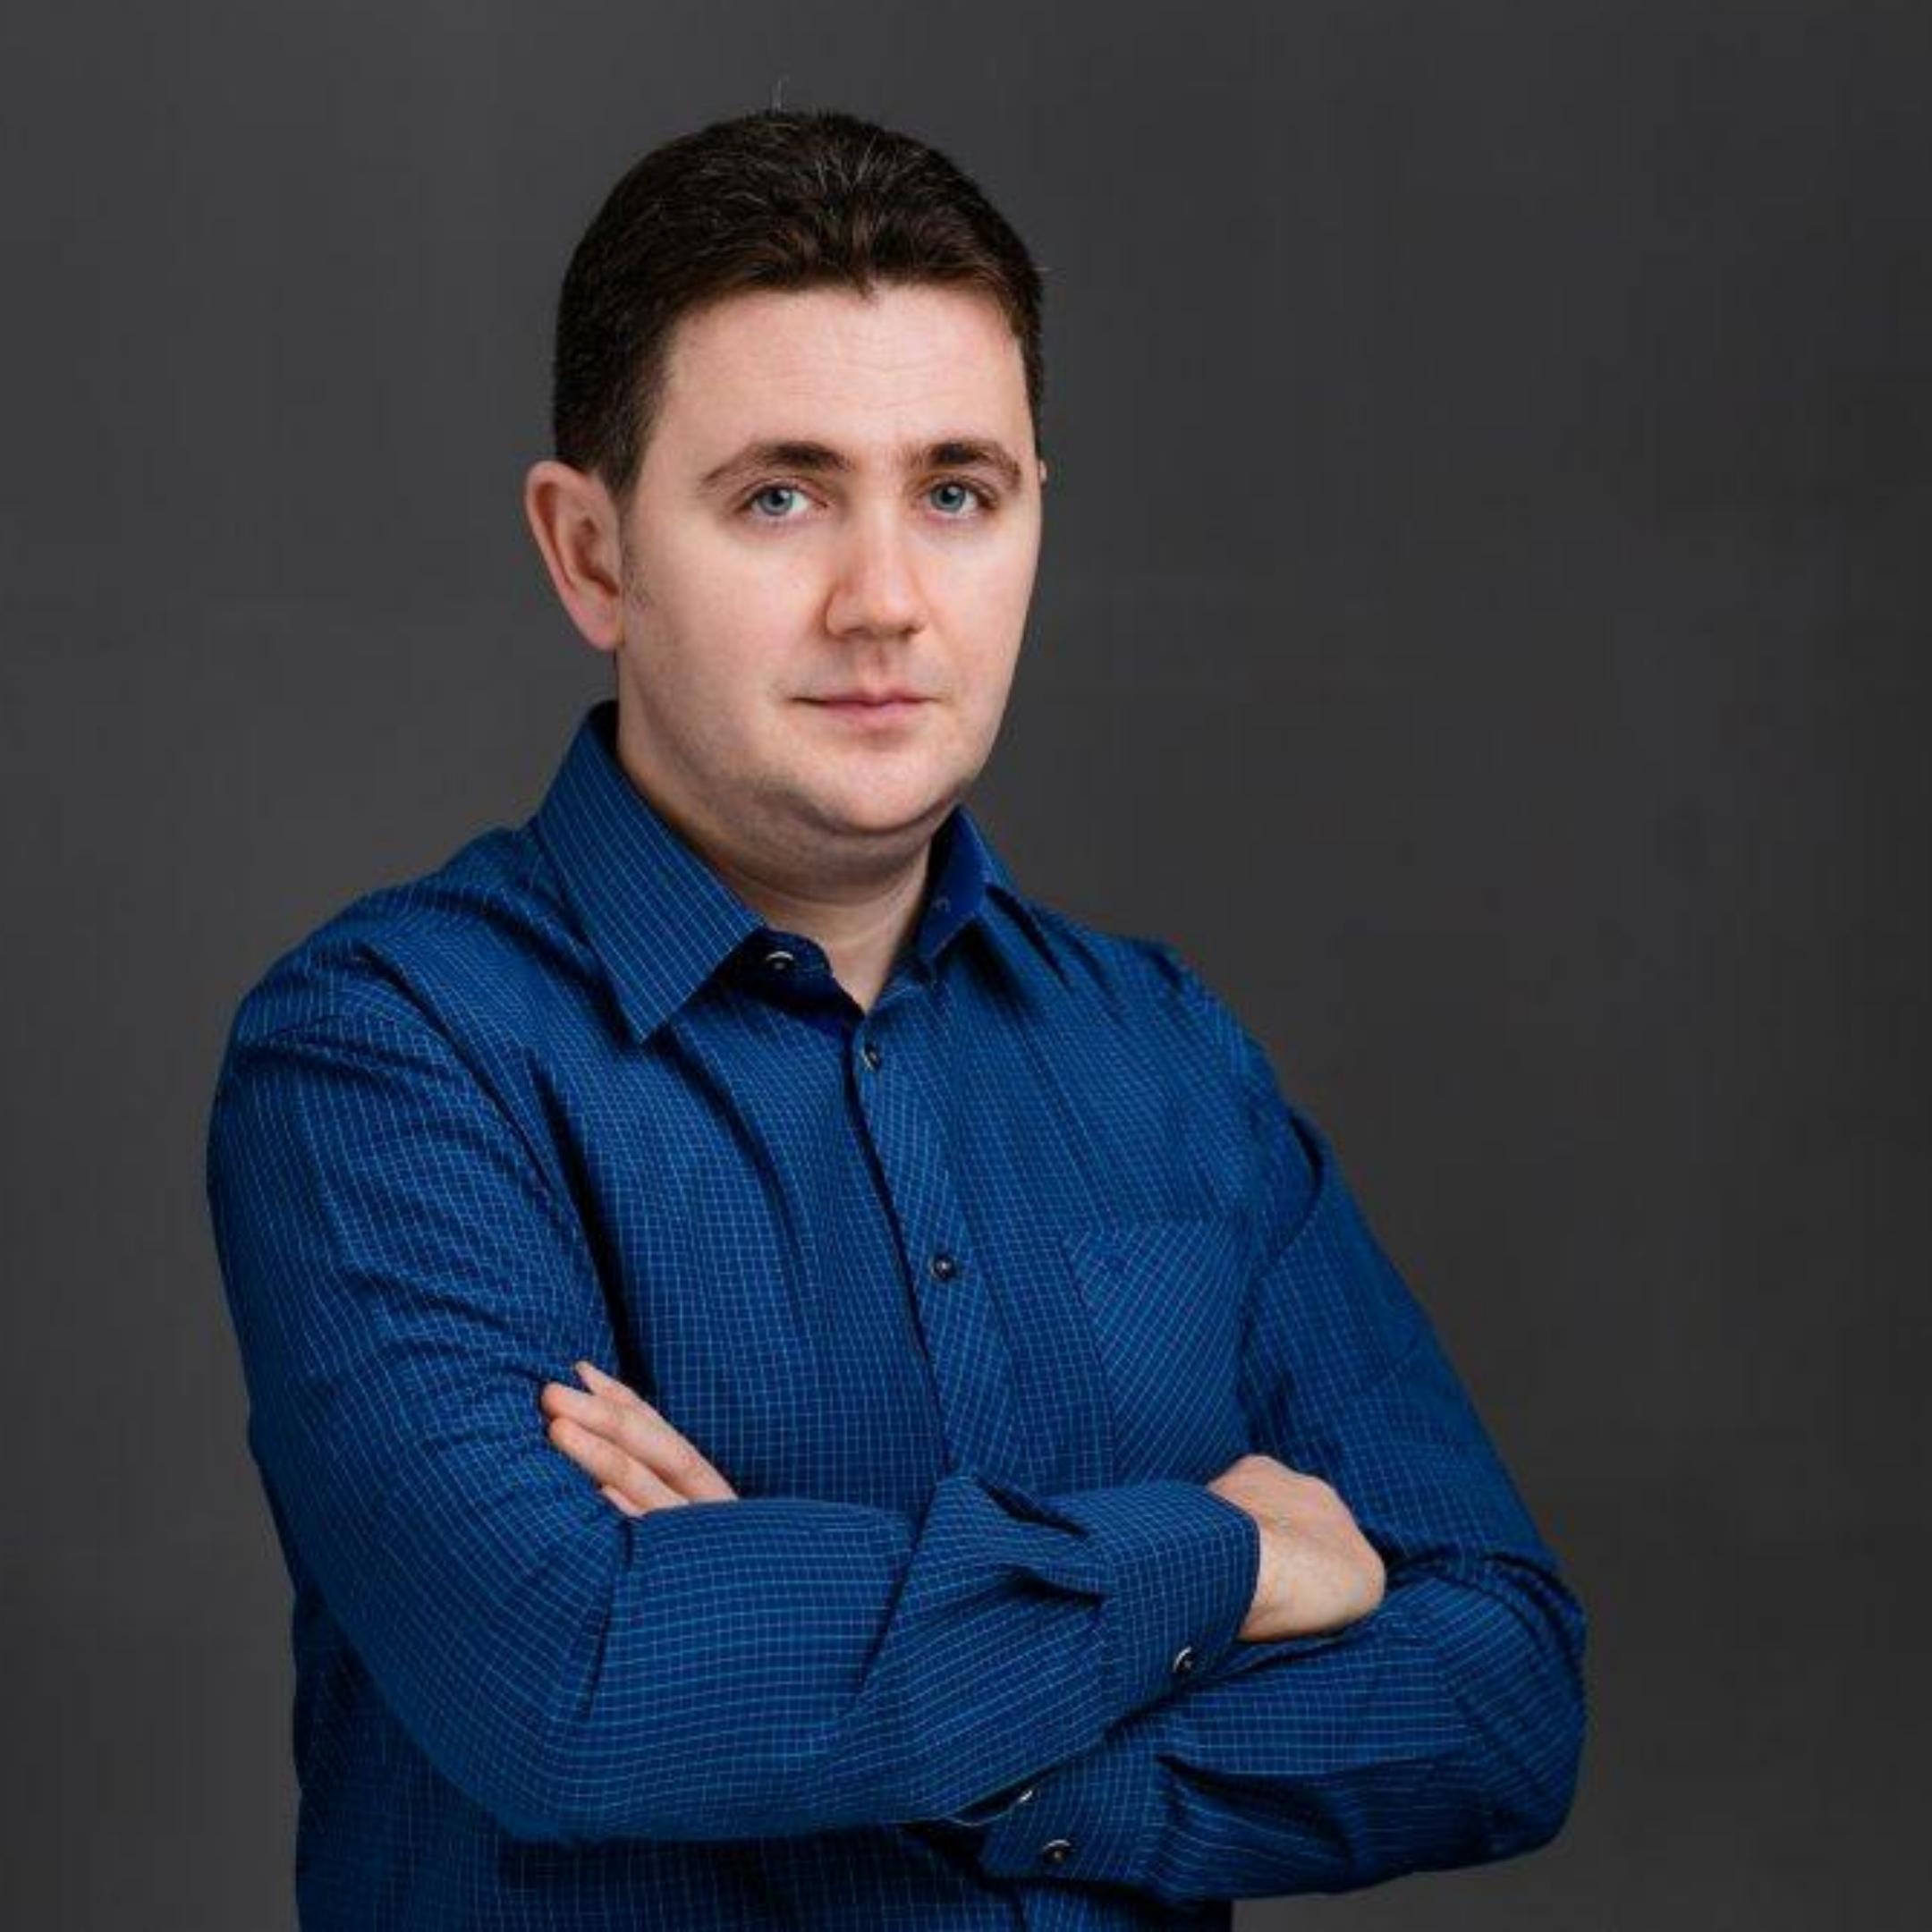 Емилиян Енев